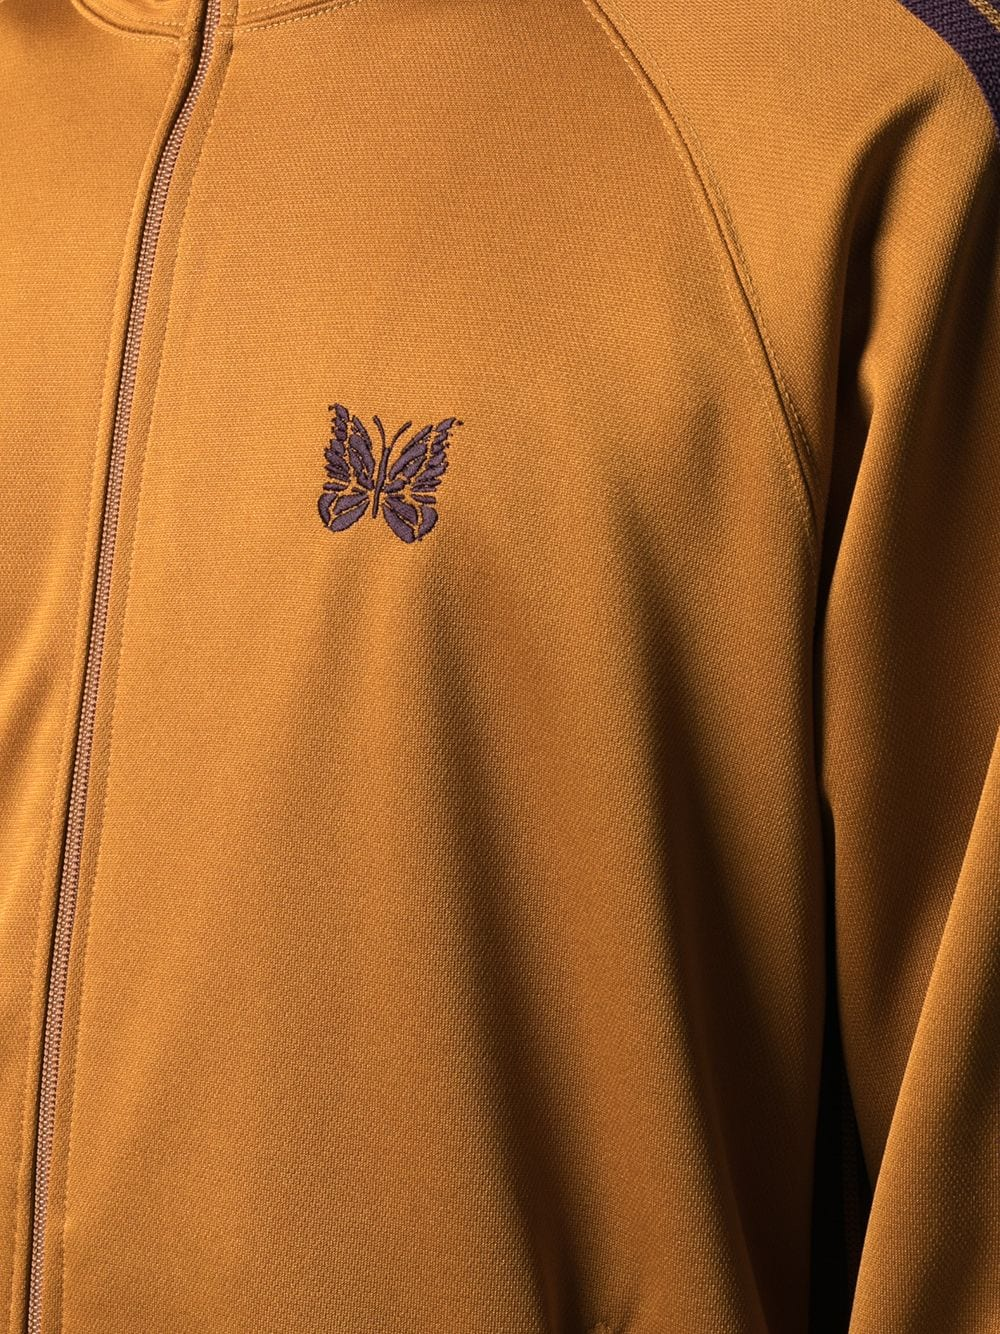 Needles needles jacket uomo NEEDLES | Giacche | IN180MUSTARD